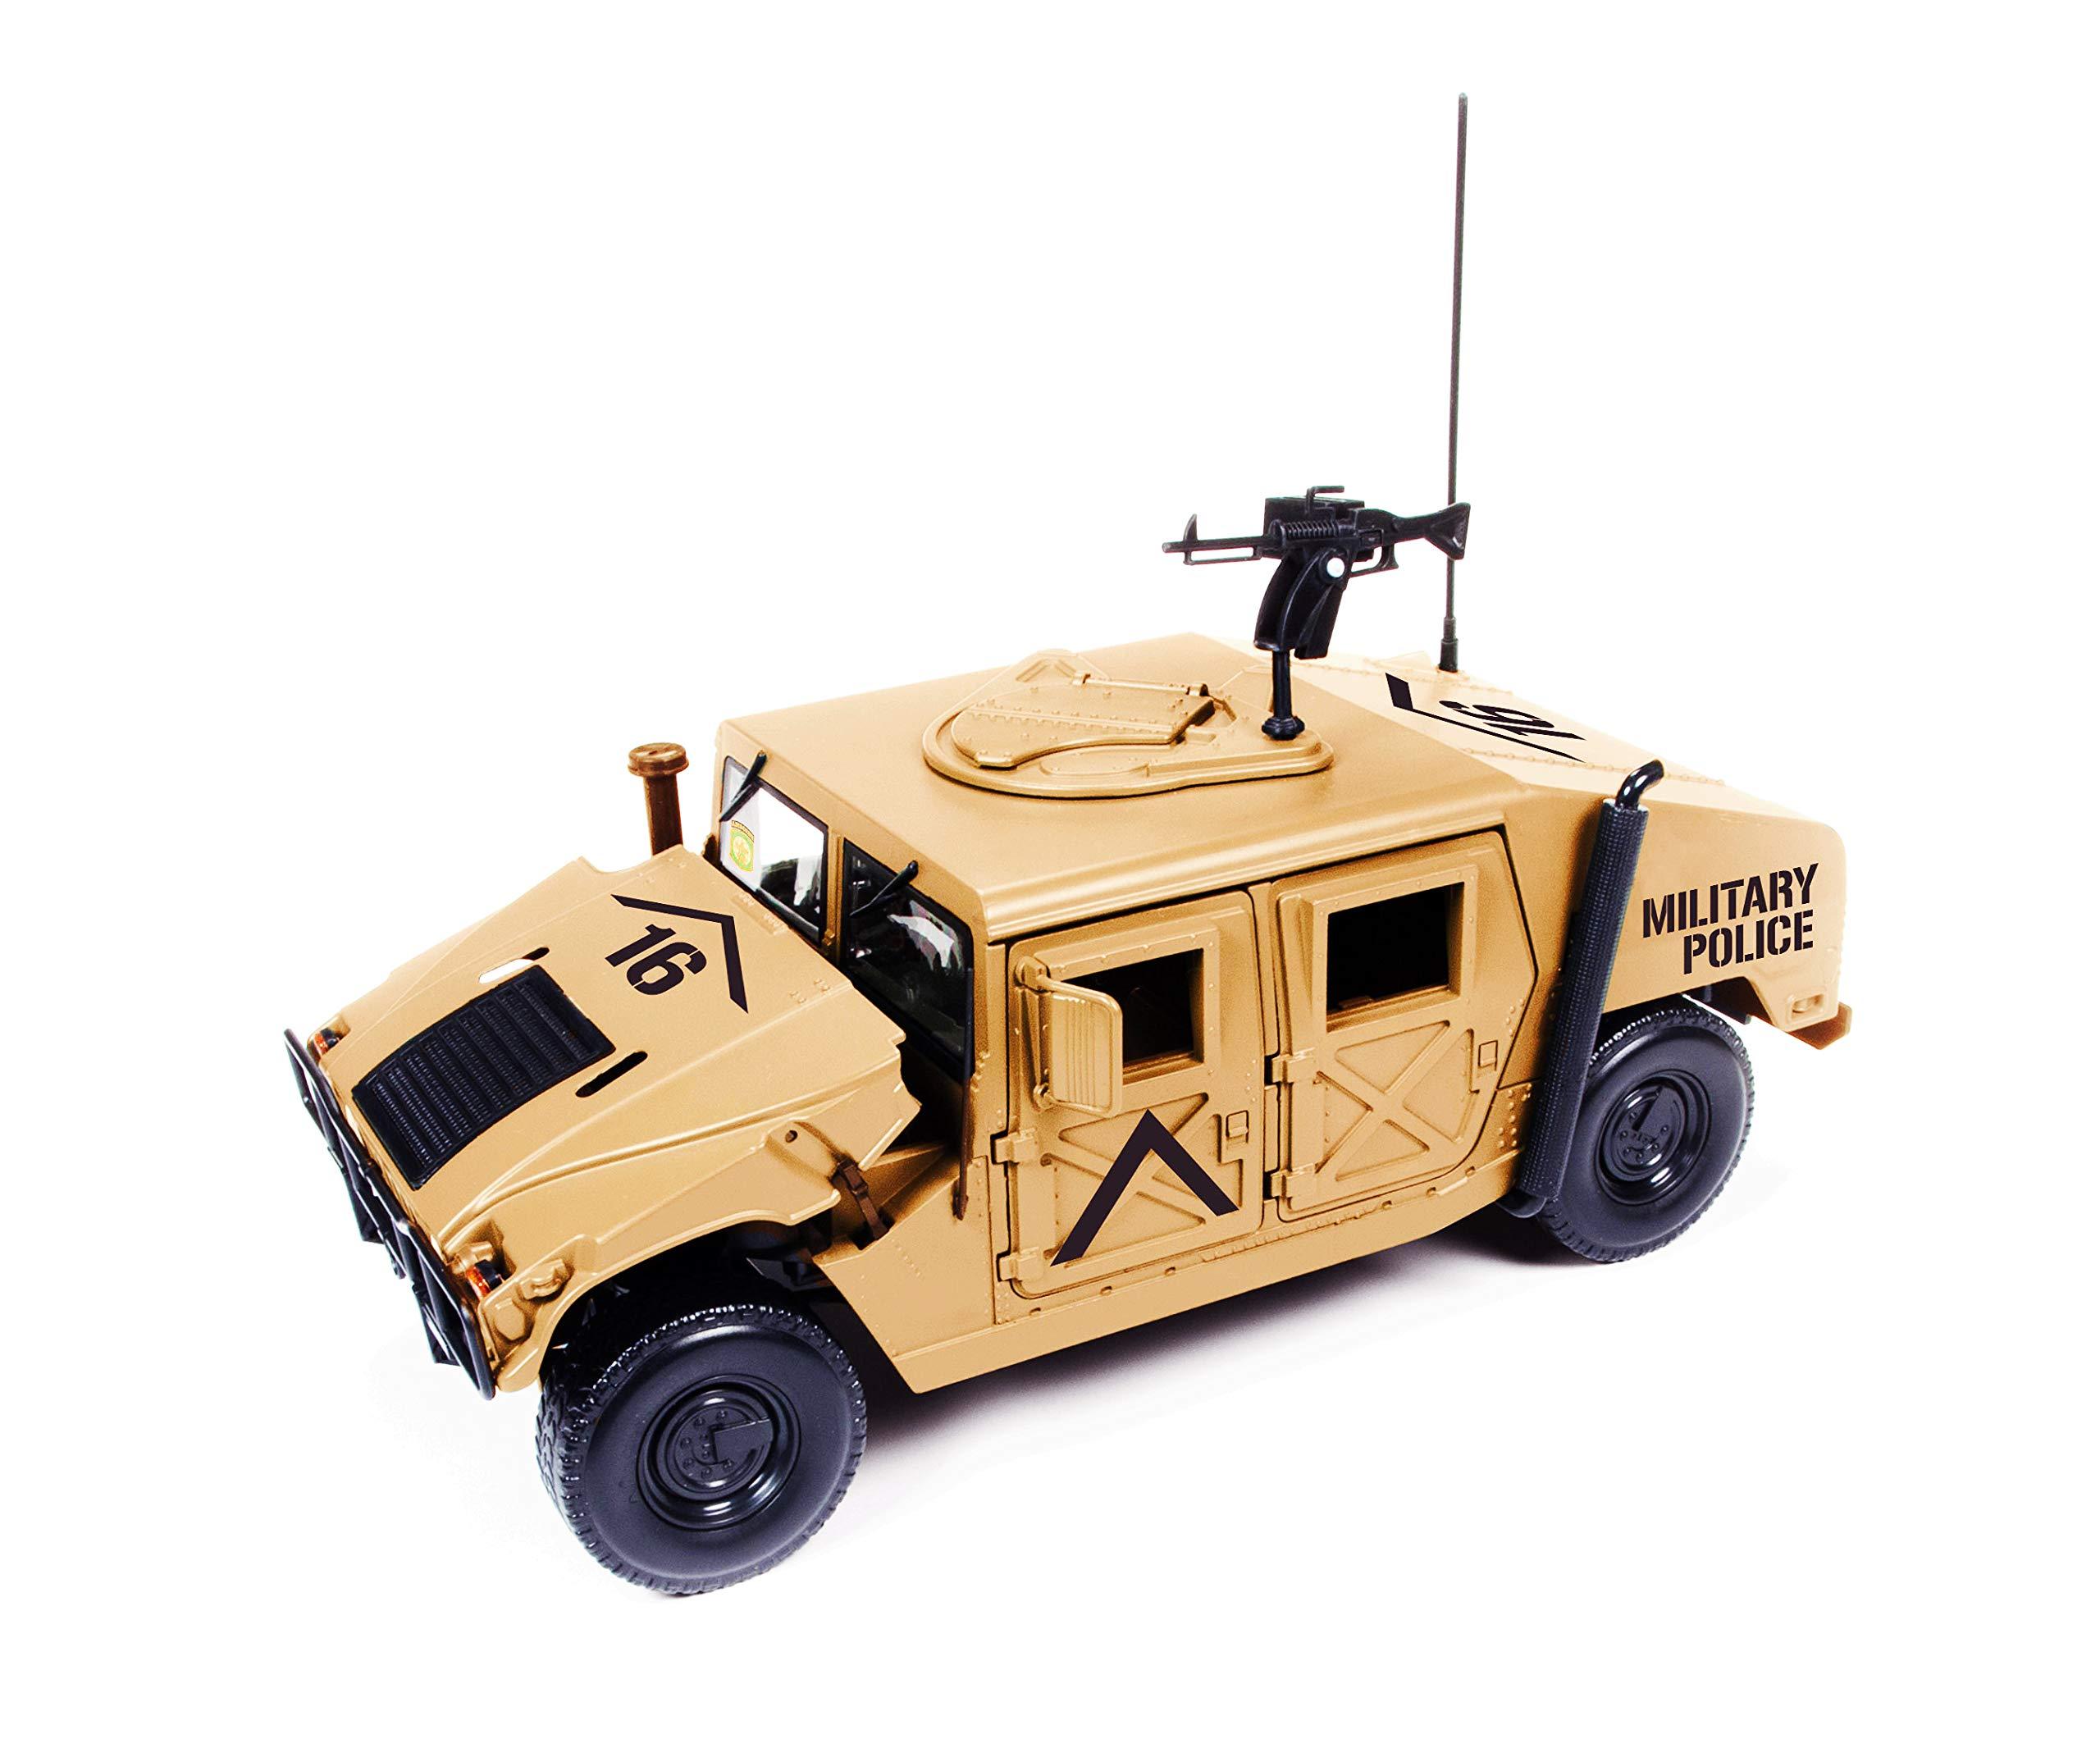 HMMWV (Humvee) Military Police Desert Tan 1/18 Diecast Model Car by Autoworld AWML003 B